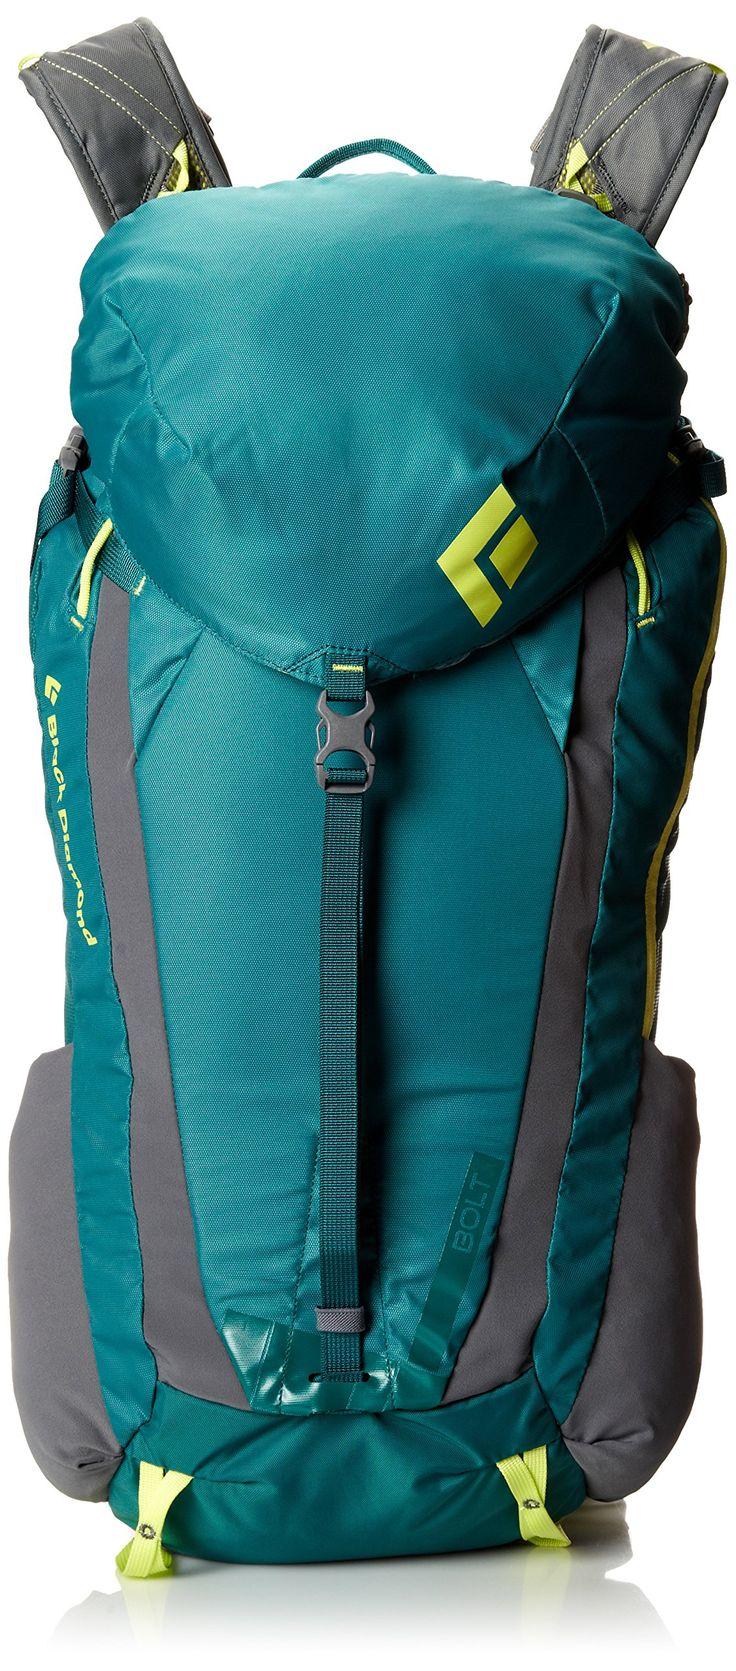 Amazon.com : Black Diamond Bolt Backpack, Coal, Small/Medium : Hiking Daypacks : Sports & Outdoors